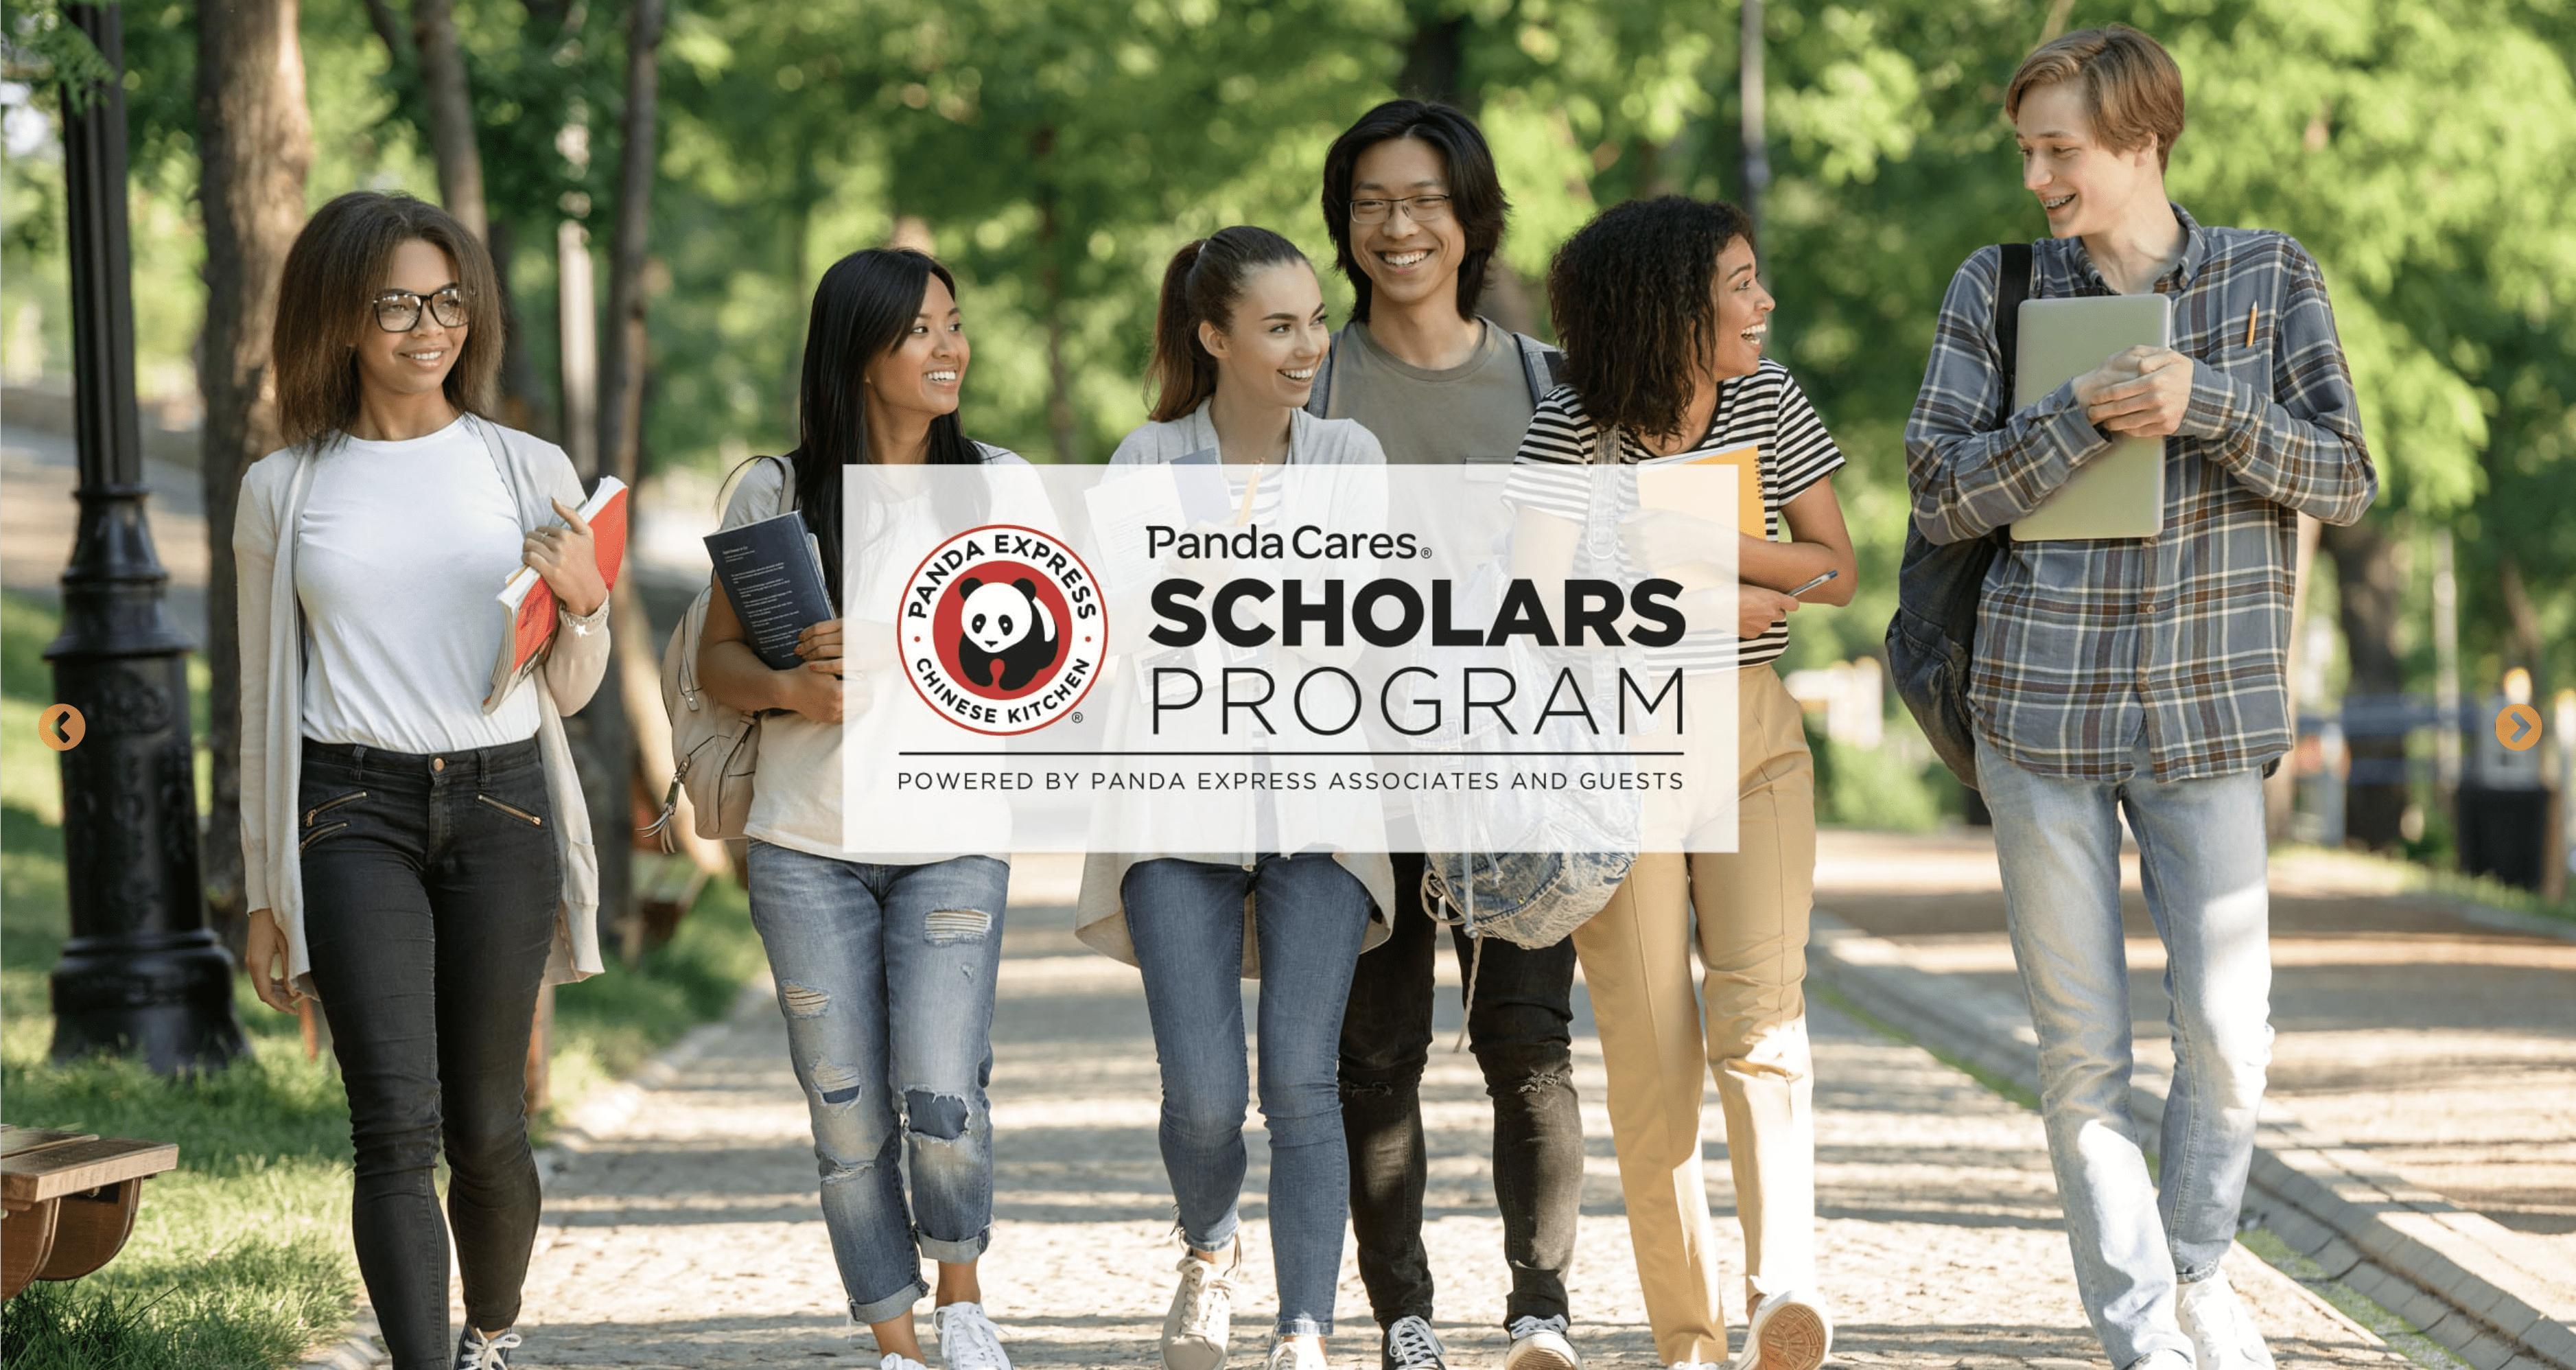 Panda Cares Scholars Program